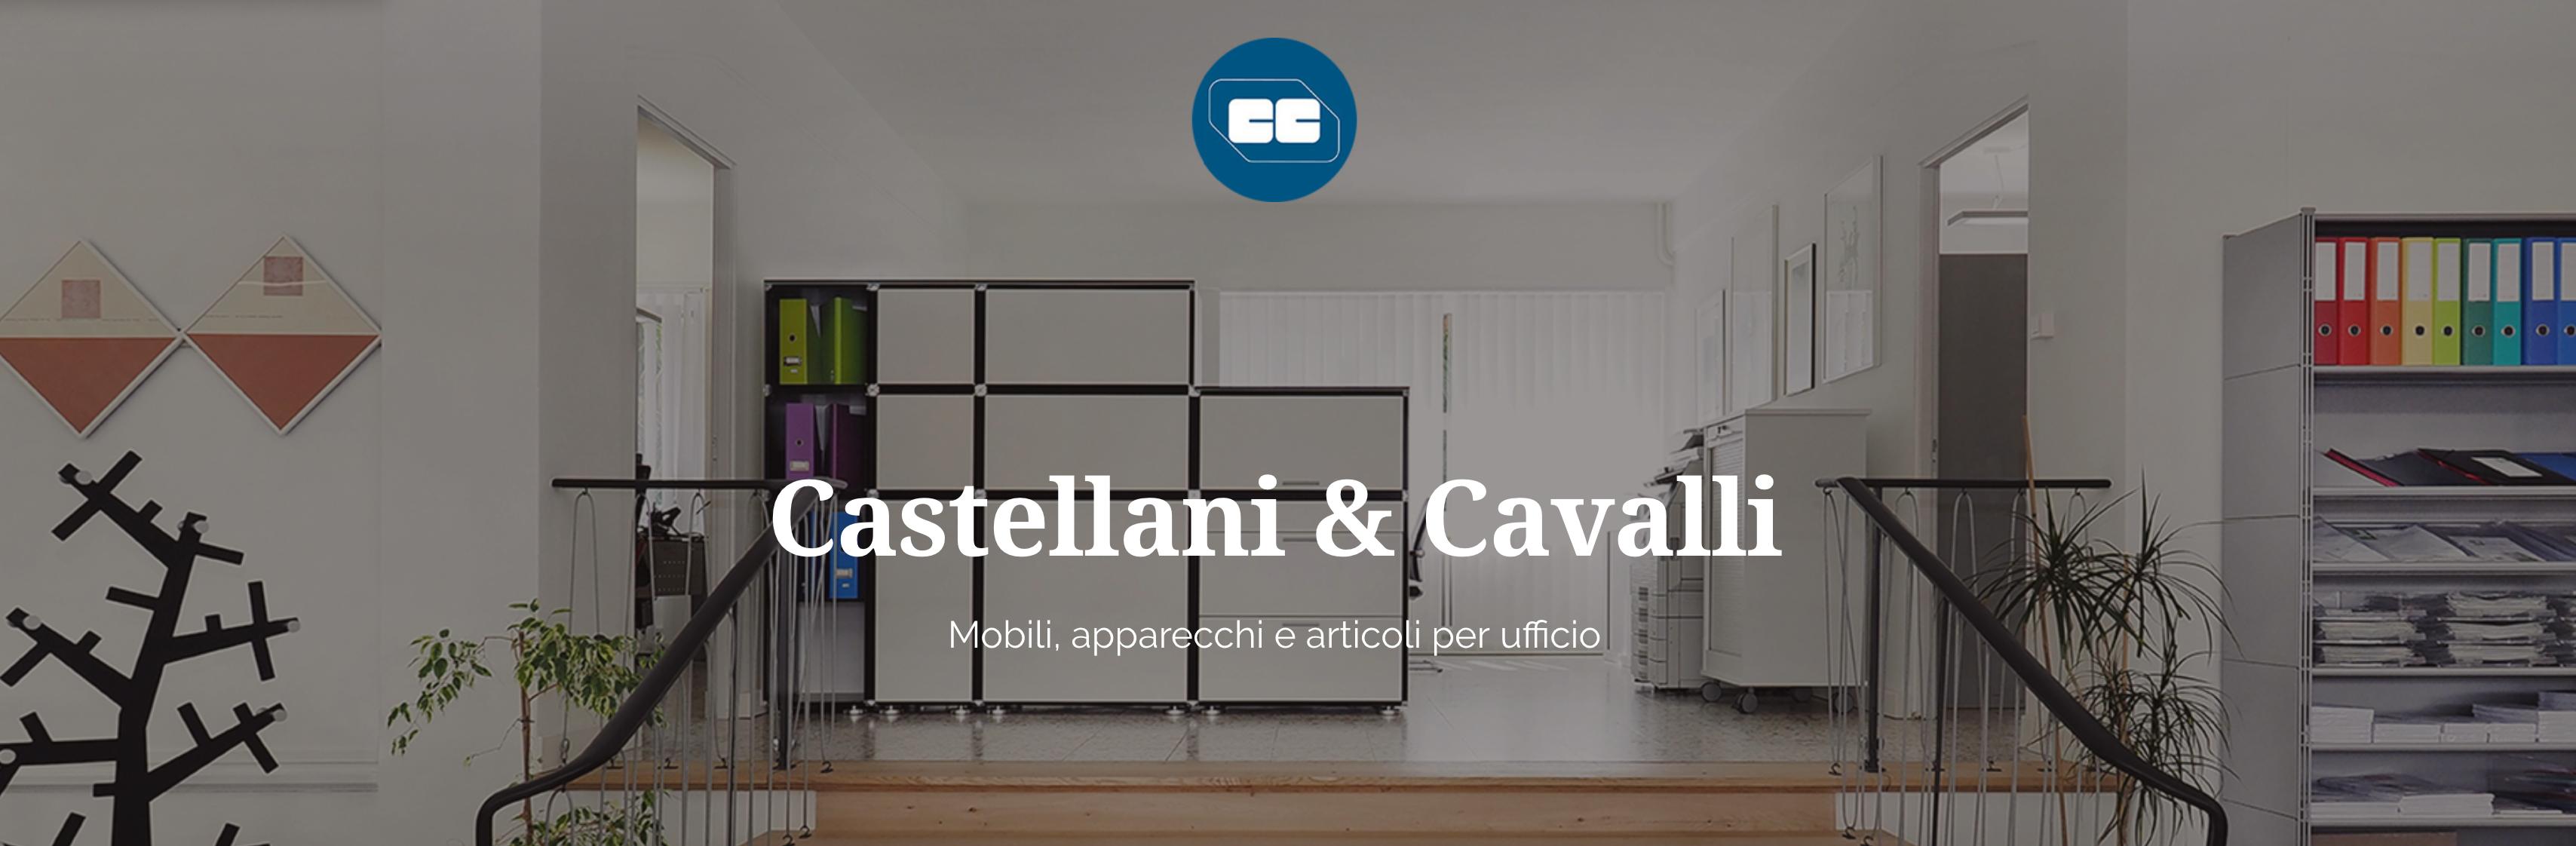 castellani-3